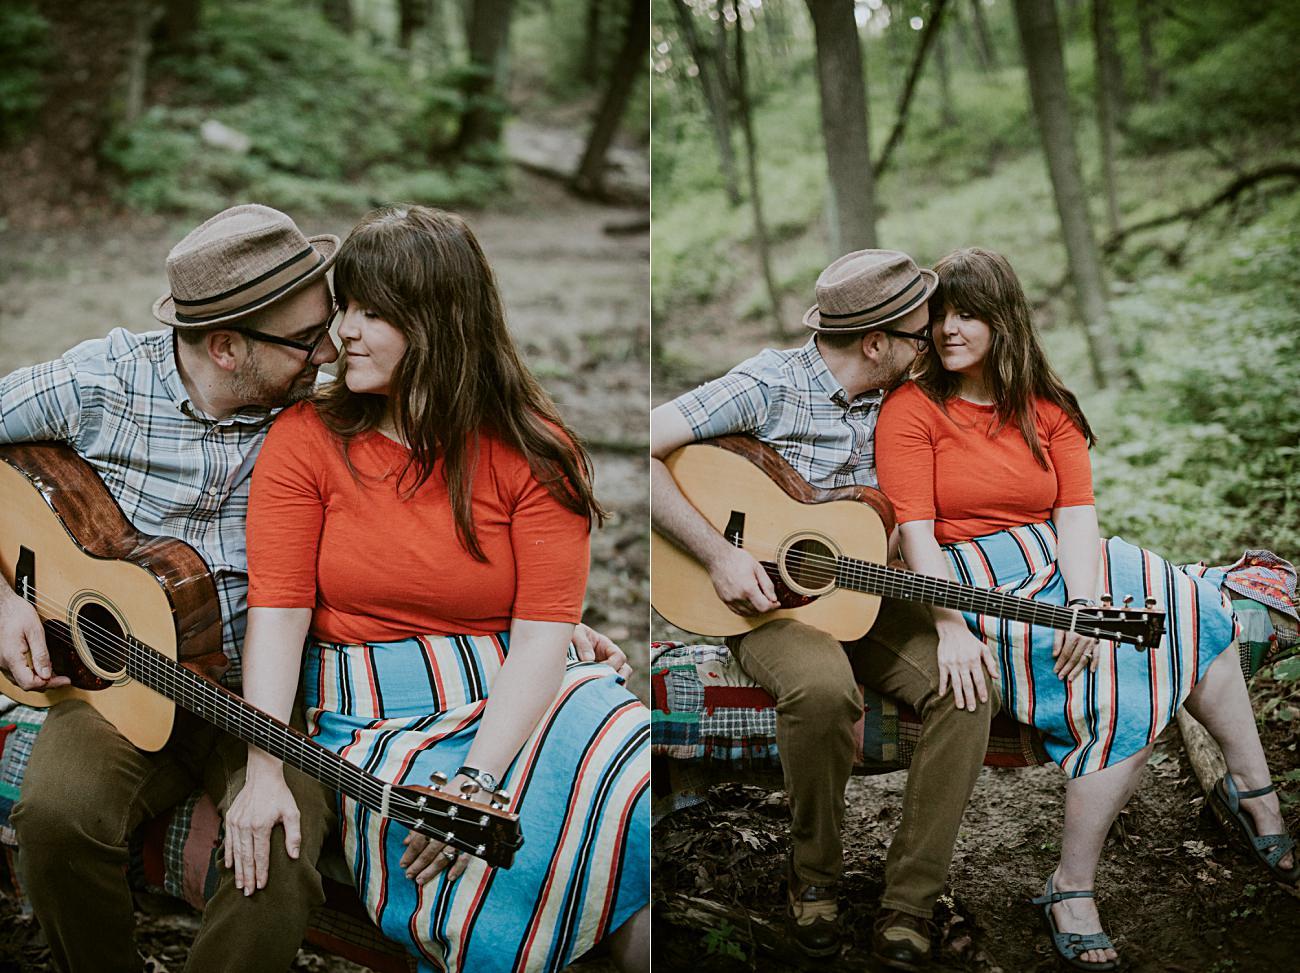 Milwaukee Engagement Session by Lake Michigan, Milwaukee Wedding Photographer, Engagement with guitars